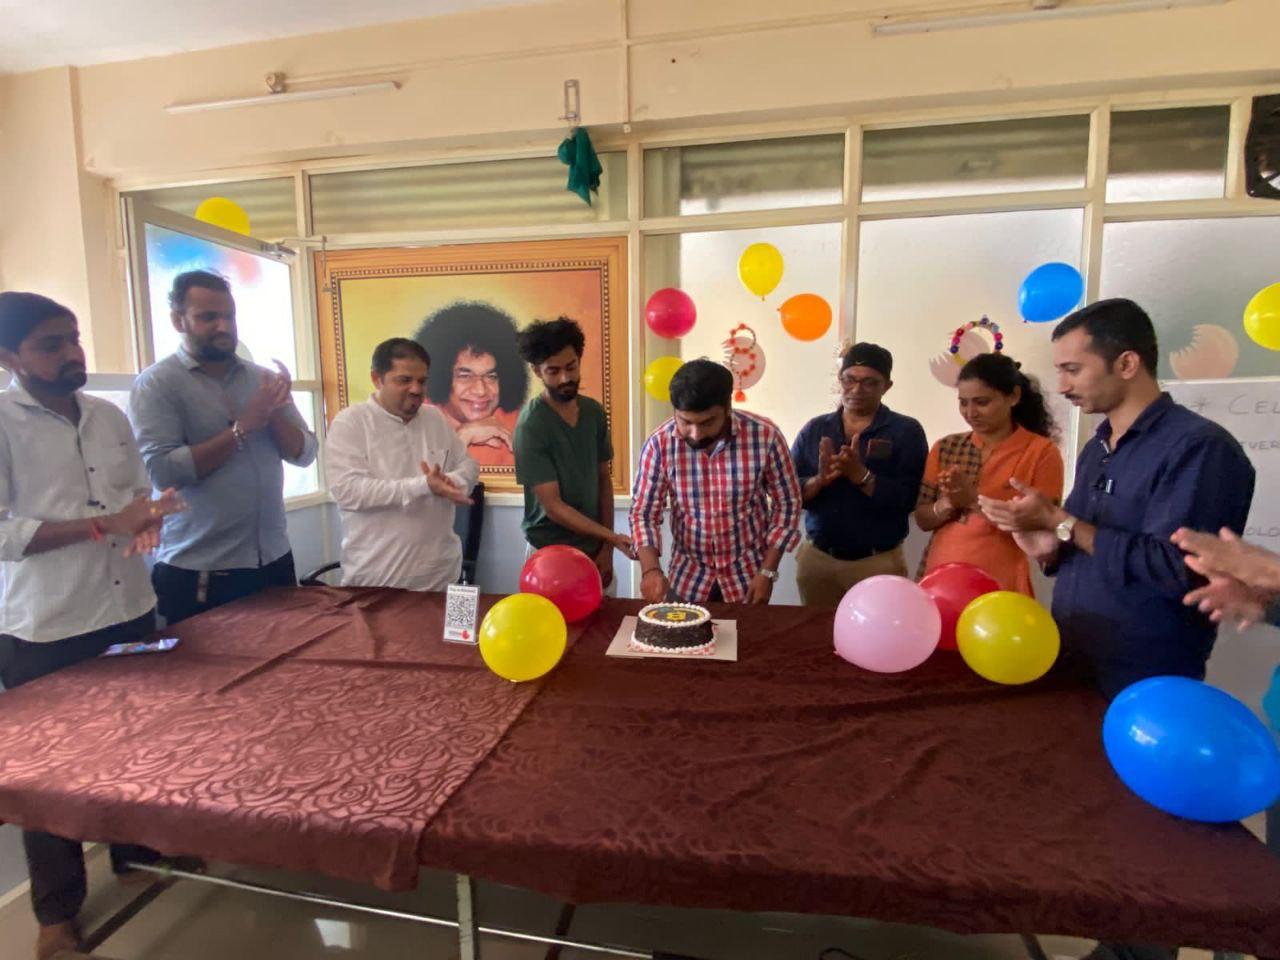 BITCOINZ BIRTHDAY CAKE